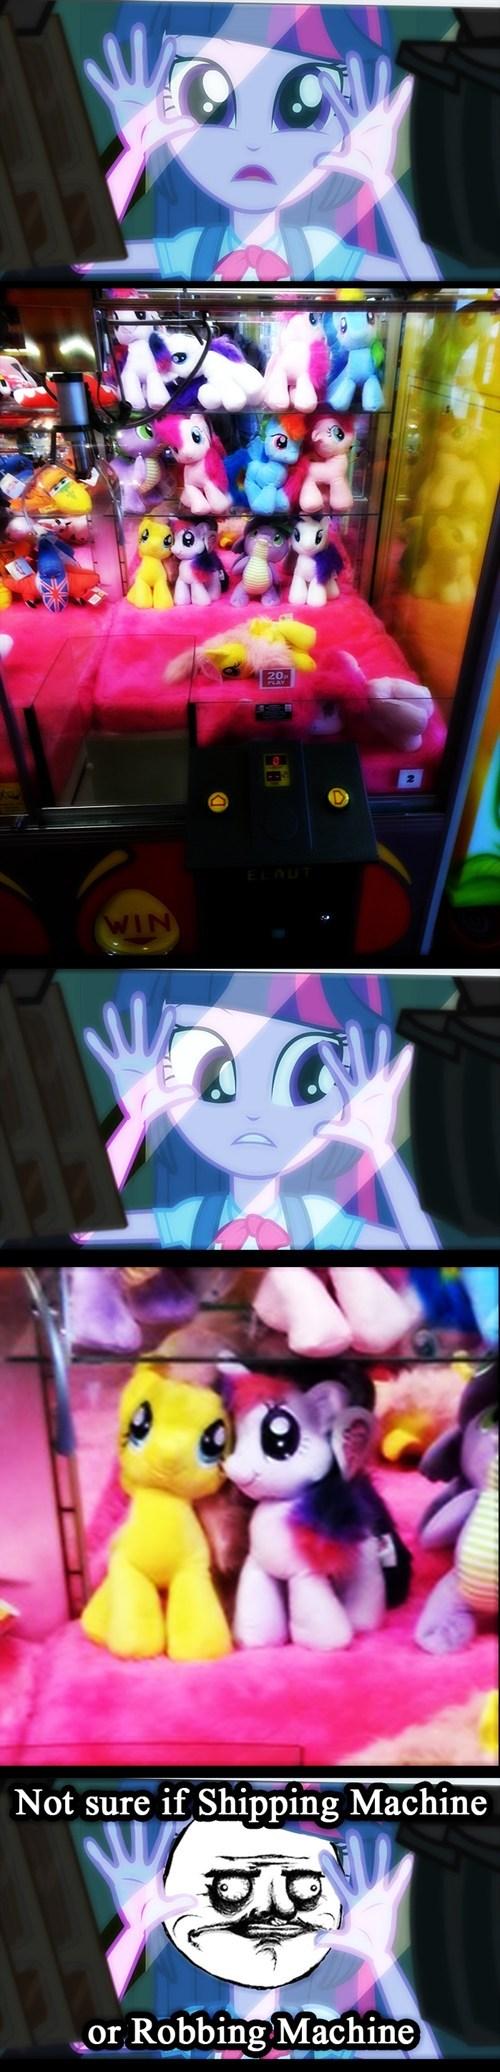 equestria girls twilight sparkle ship - 7824465664